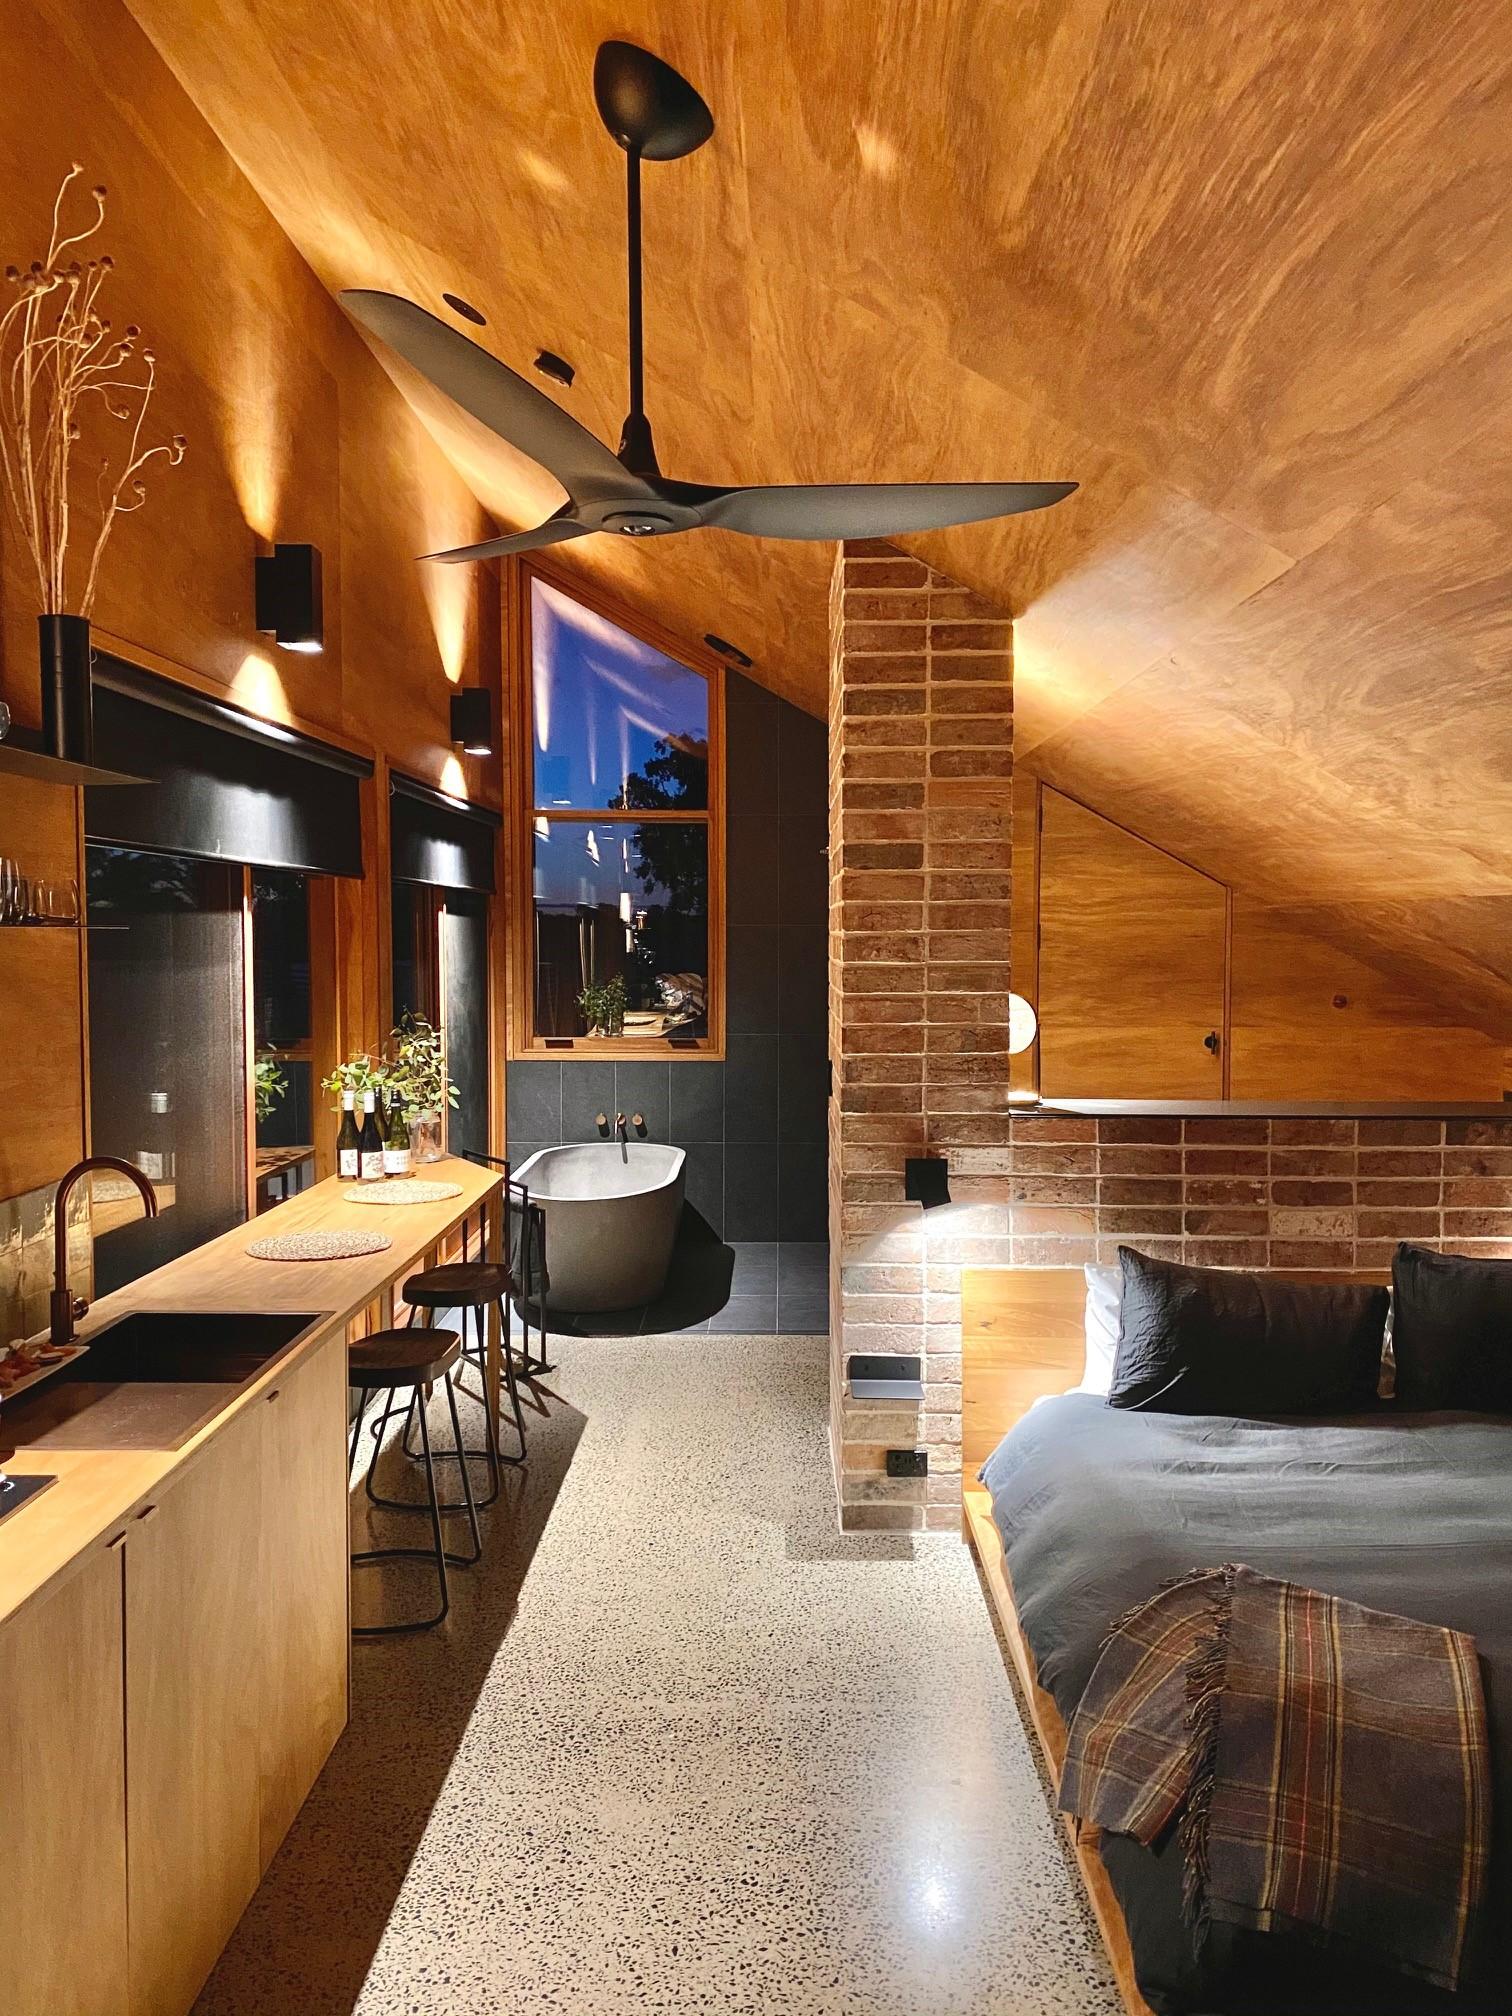 Luxury Accommodation In Mudgee - Gawthorne's Hut - Giddy guest